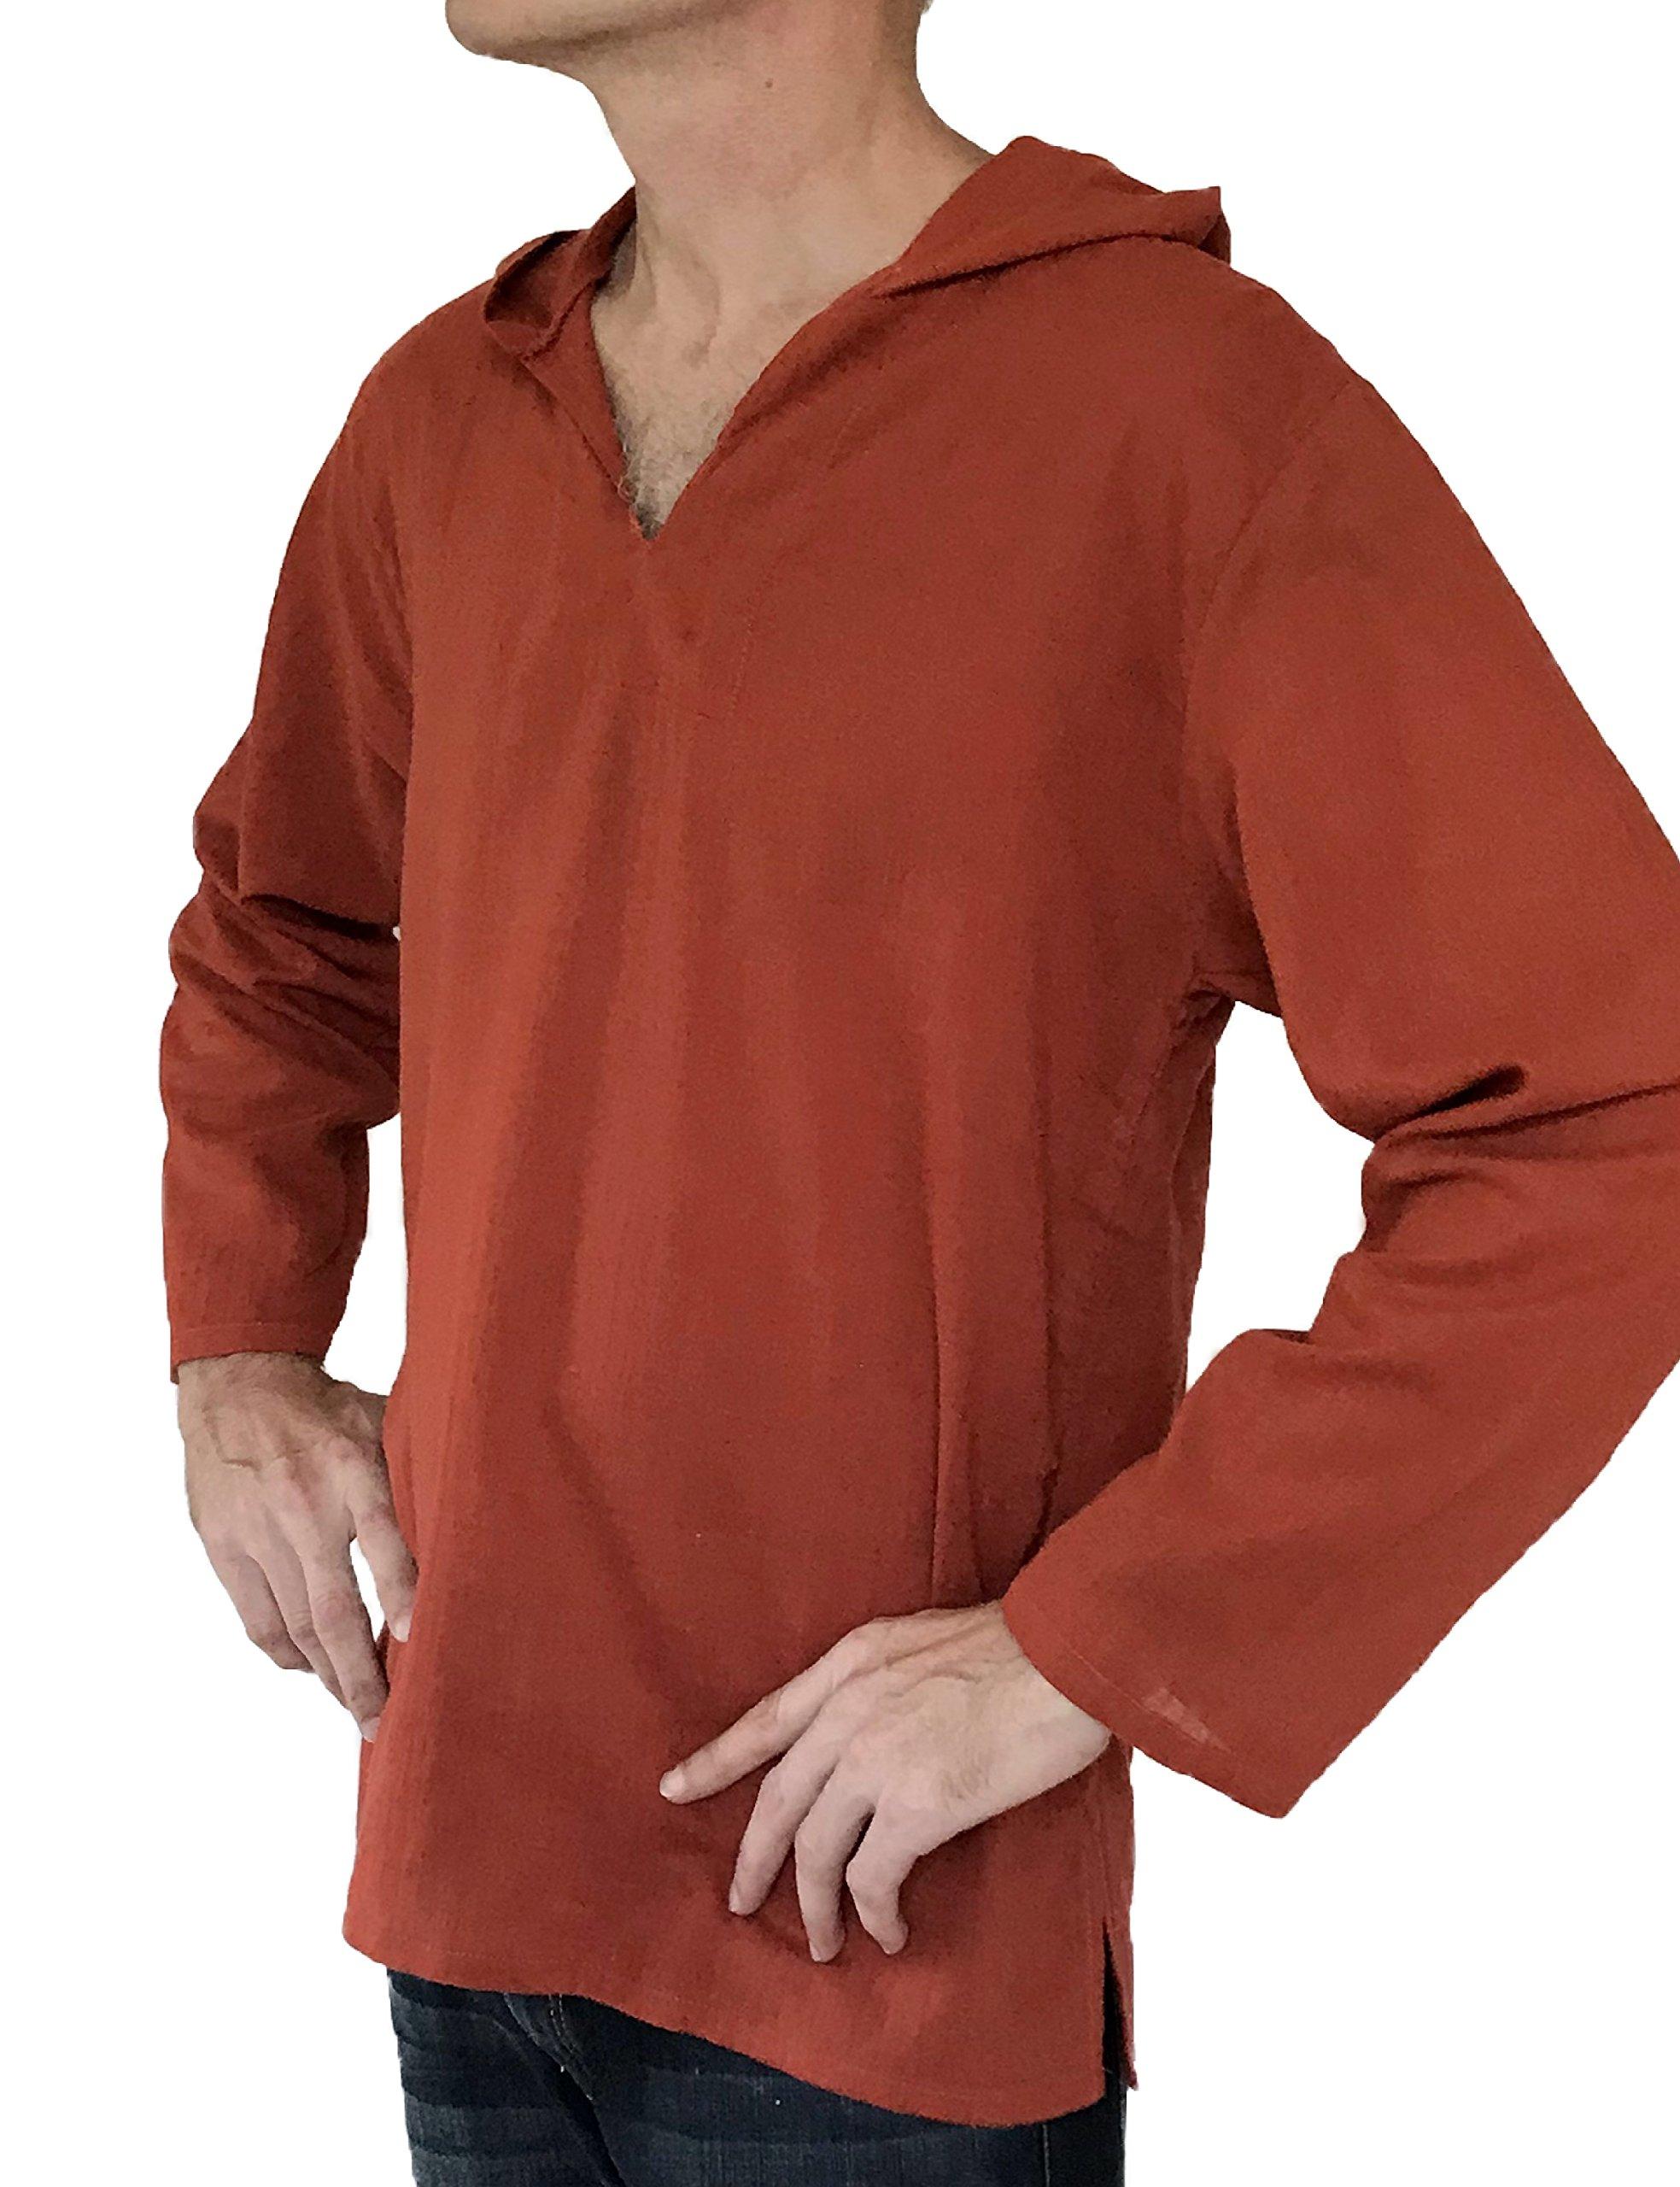 Love Quality Men's Hoodie Hippie Shirts Beach 100% Soft Cotton Top Yoga Shirt Boho (XX-Large, Brick)